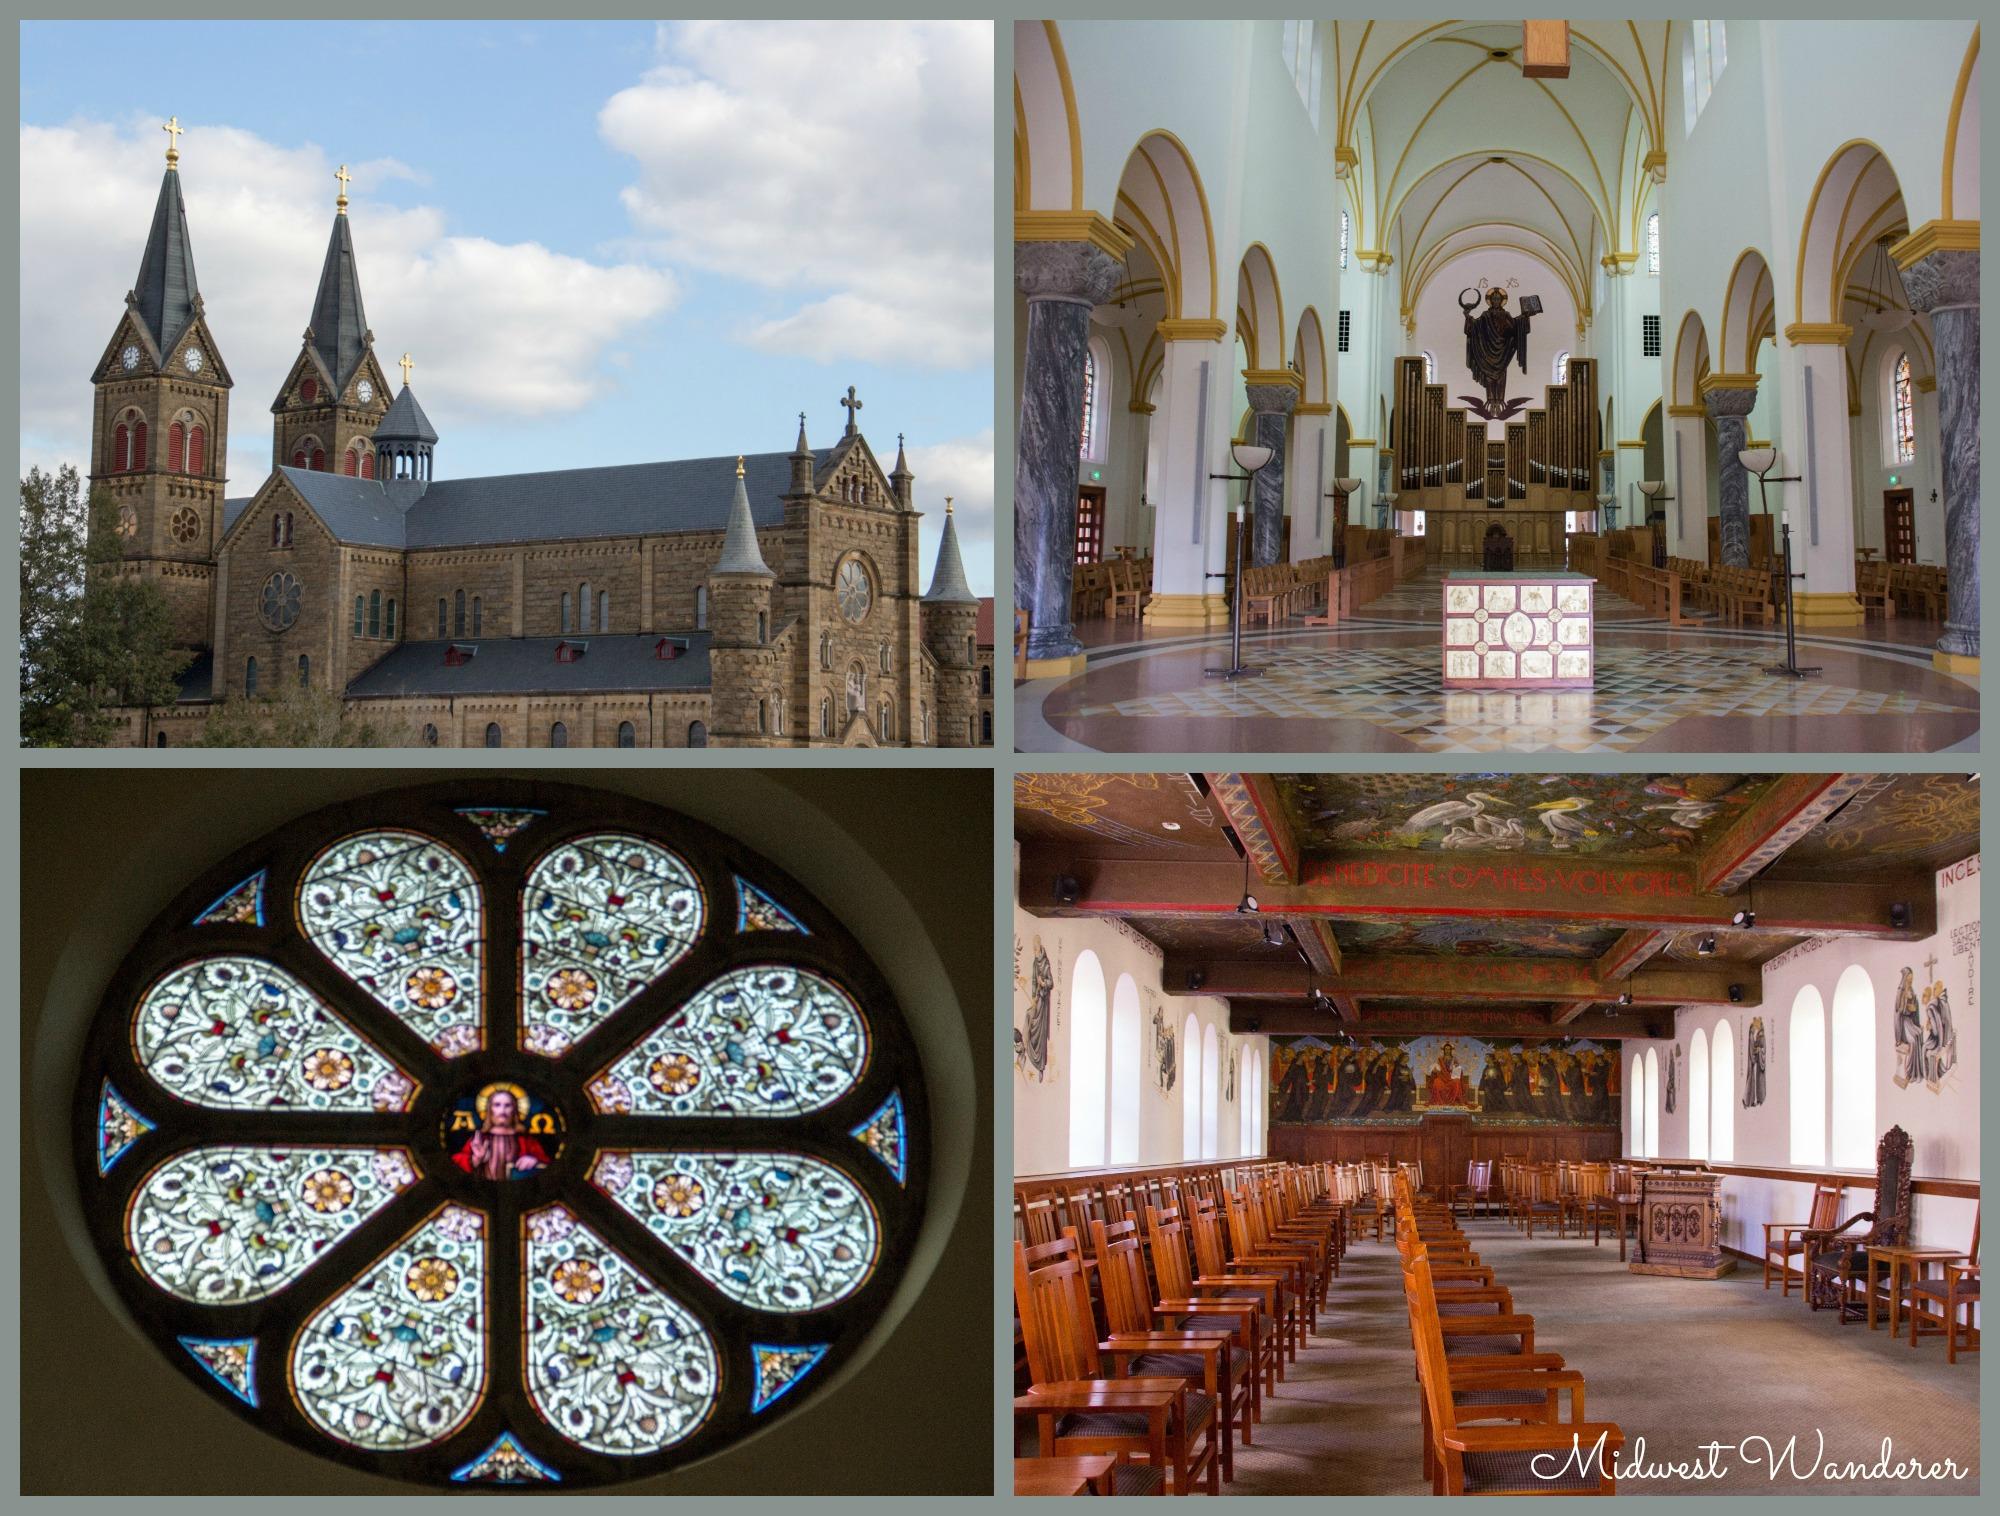 Trail of Faith - St Meinrad Archabbey